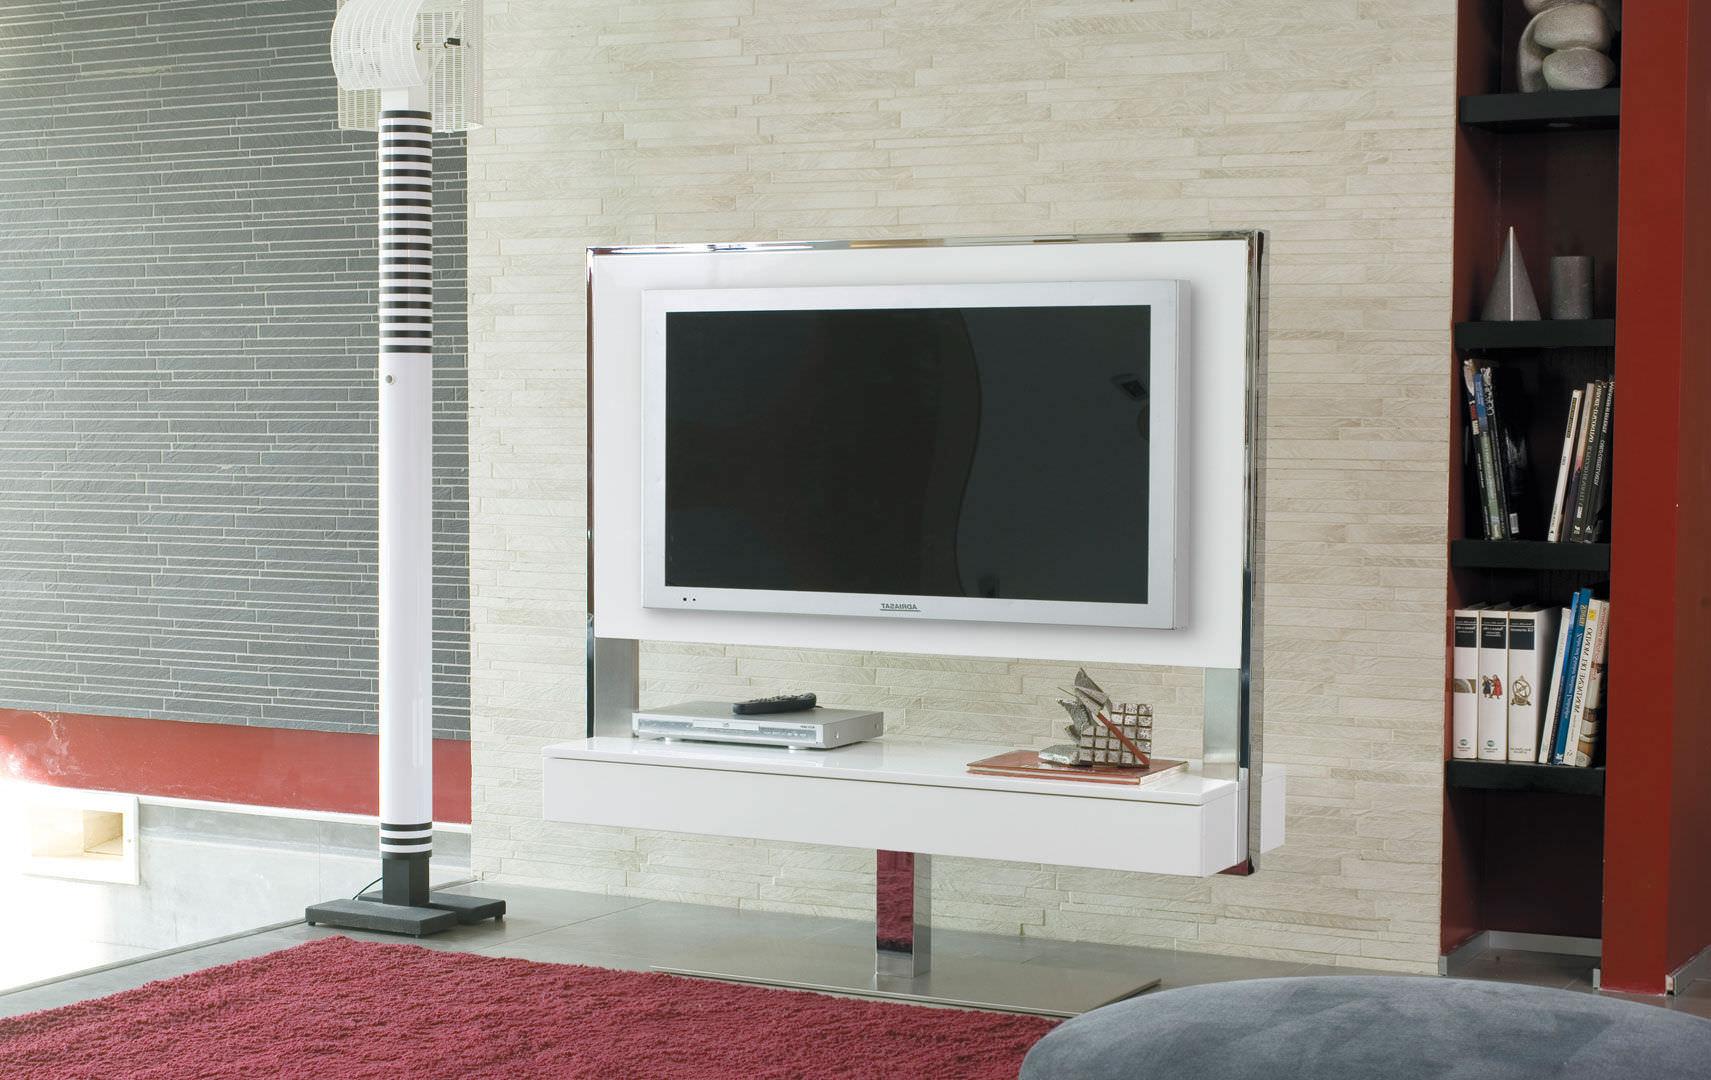 Meuble Tv Contemporain Pivotant En Acier En Bois Tecno  # Meuble Tv Rotatif